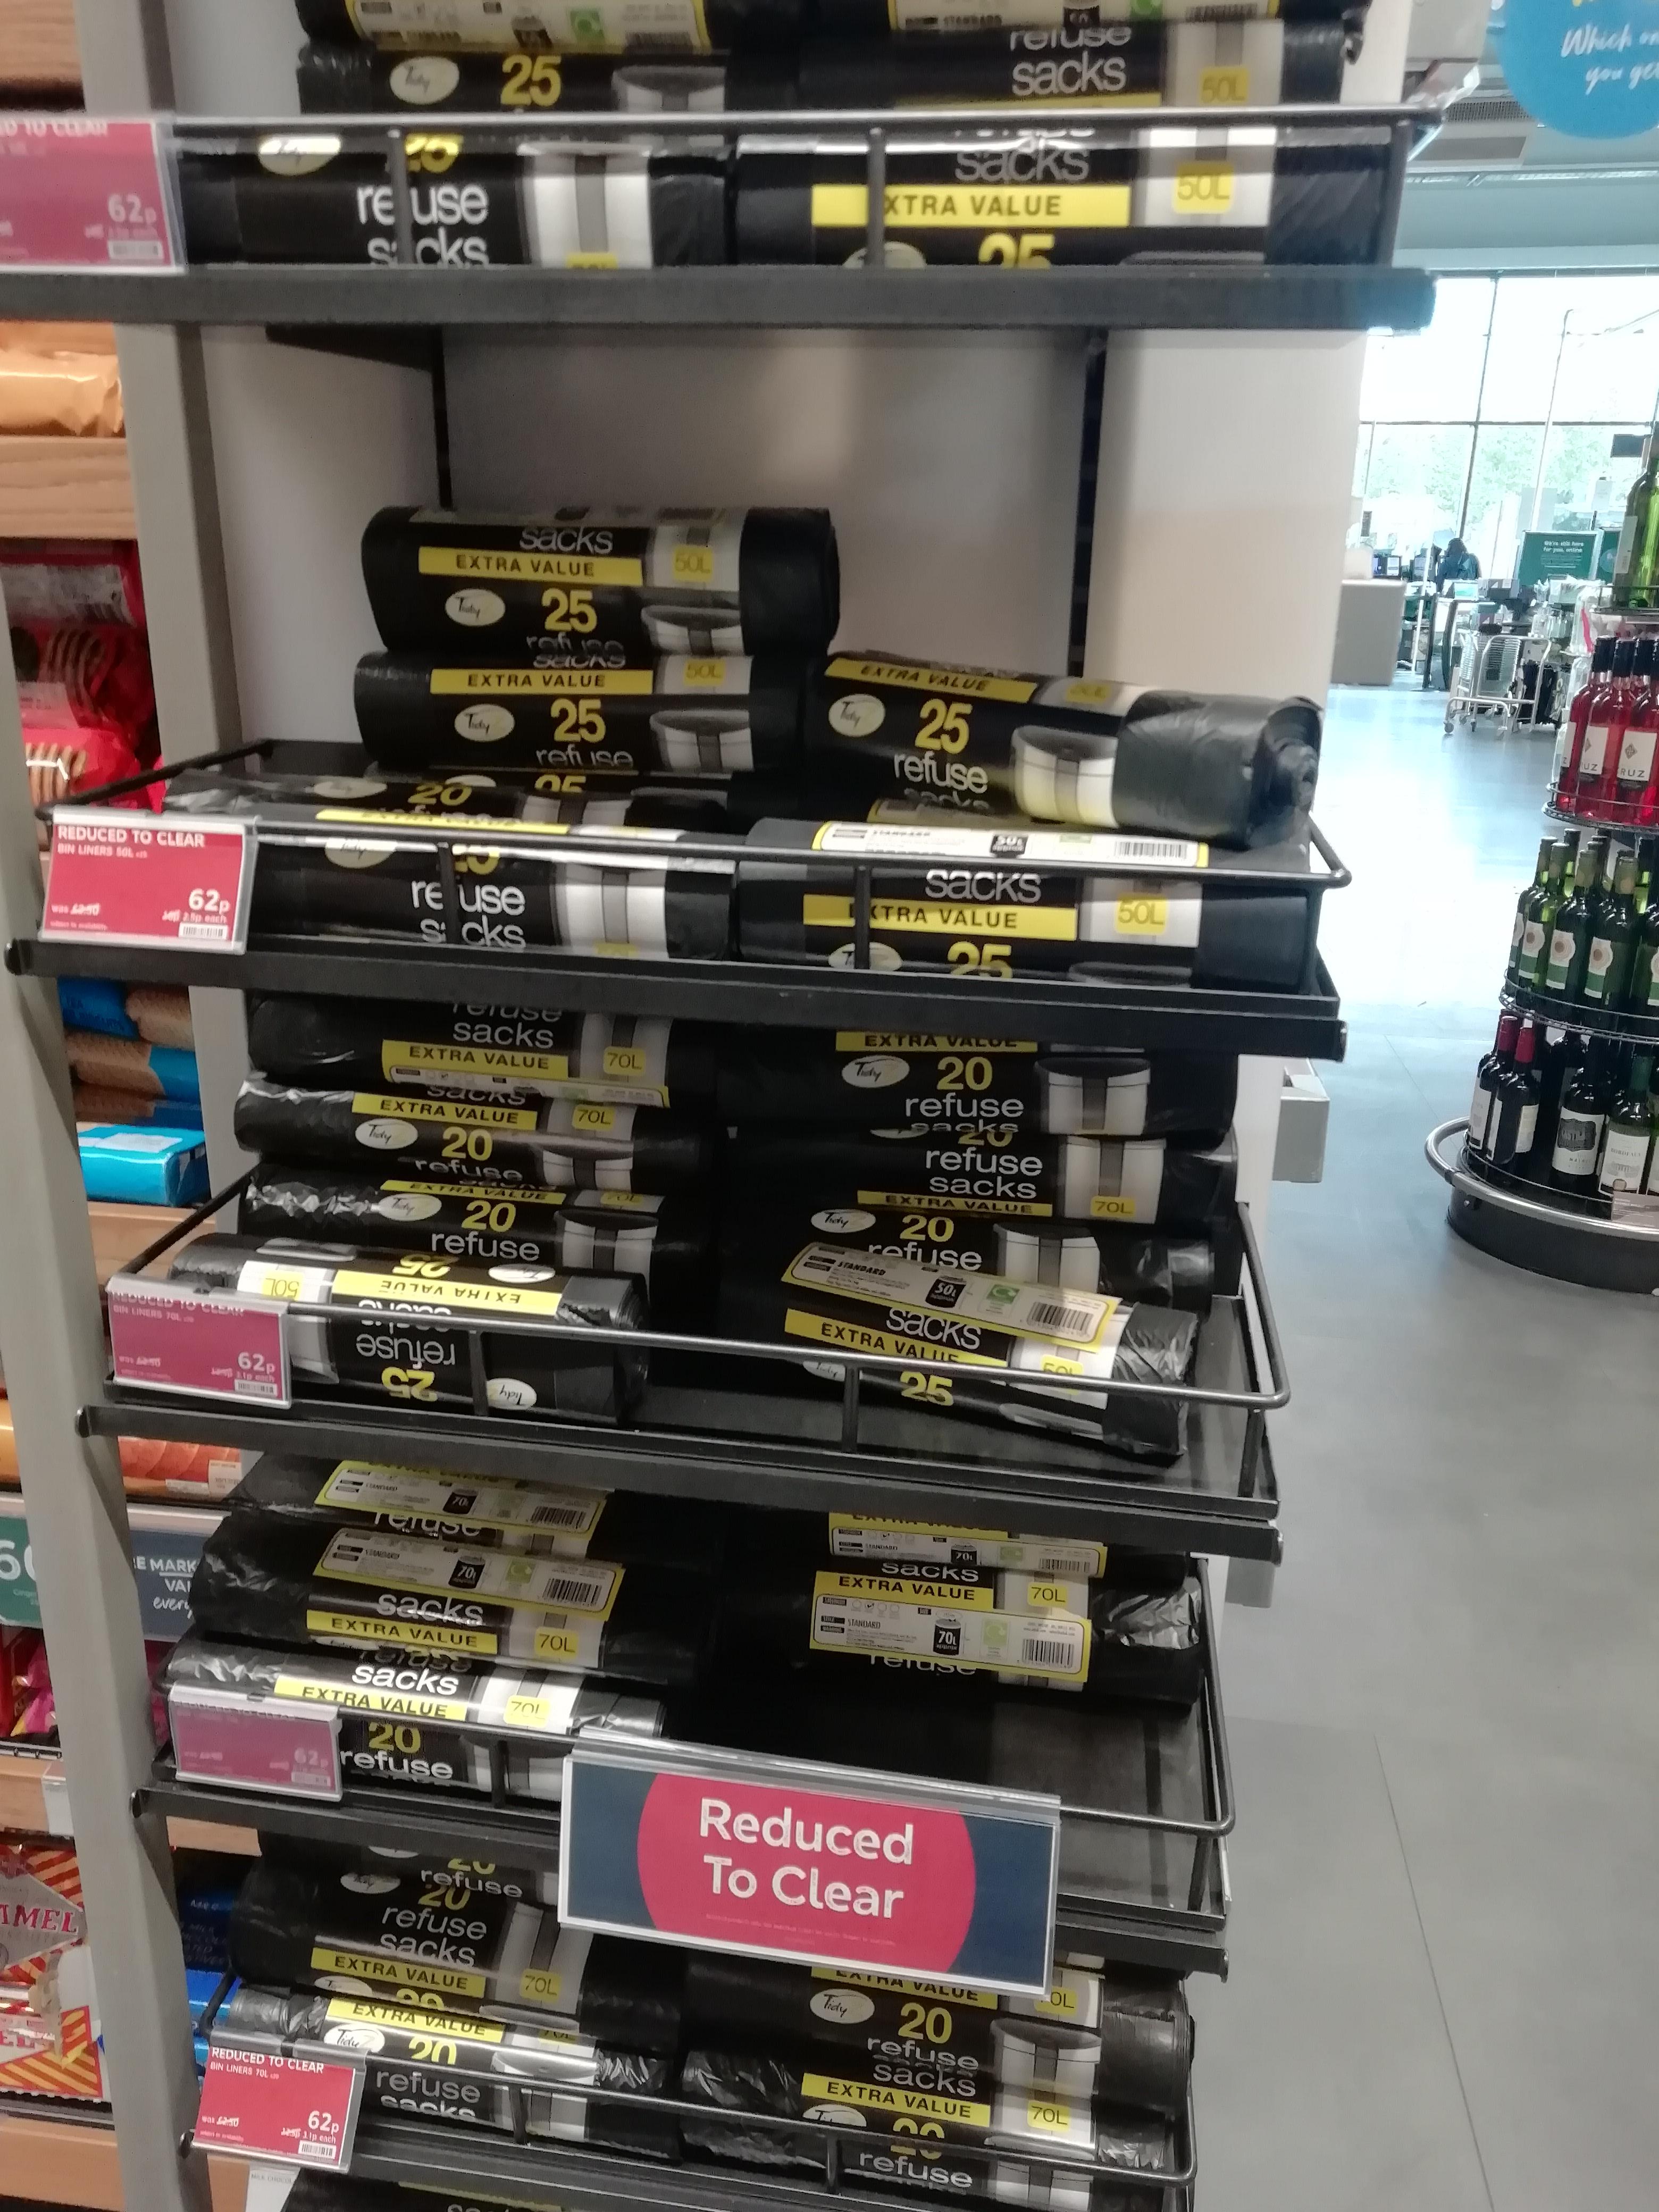 Refuse sacks 62p instore @ Marks and Spencer - Birmingham sellyoak